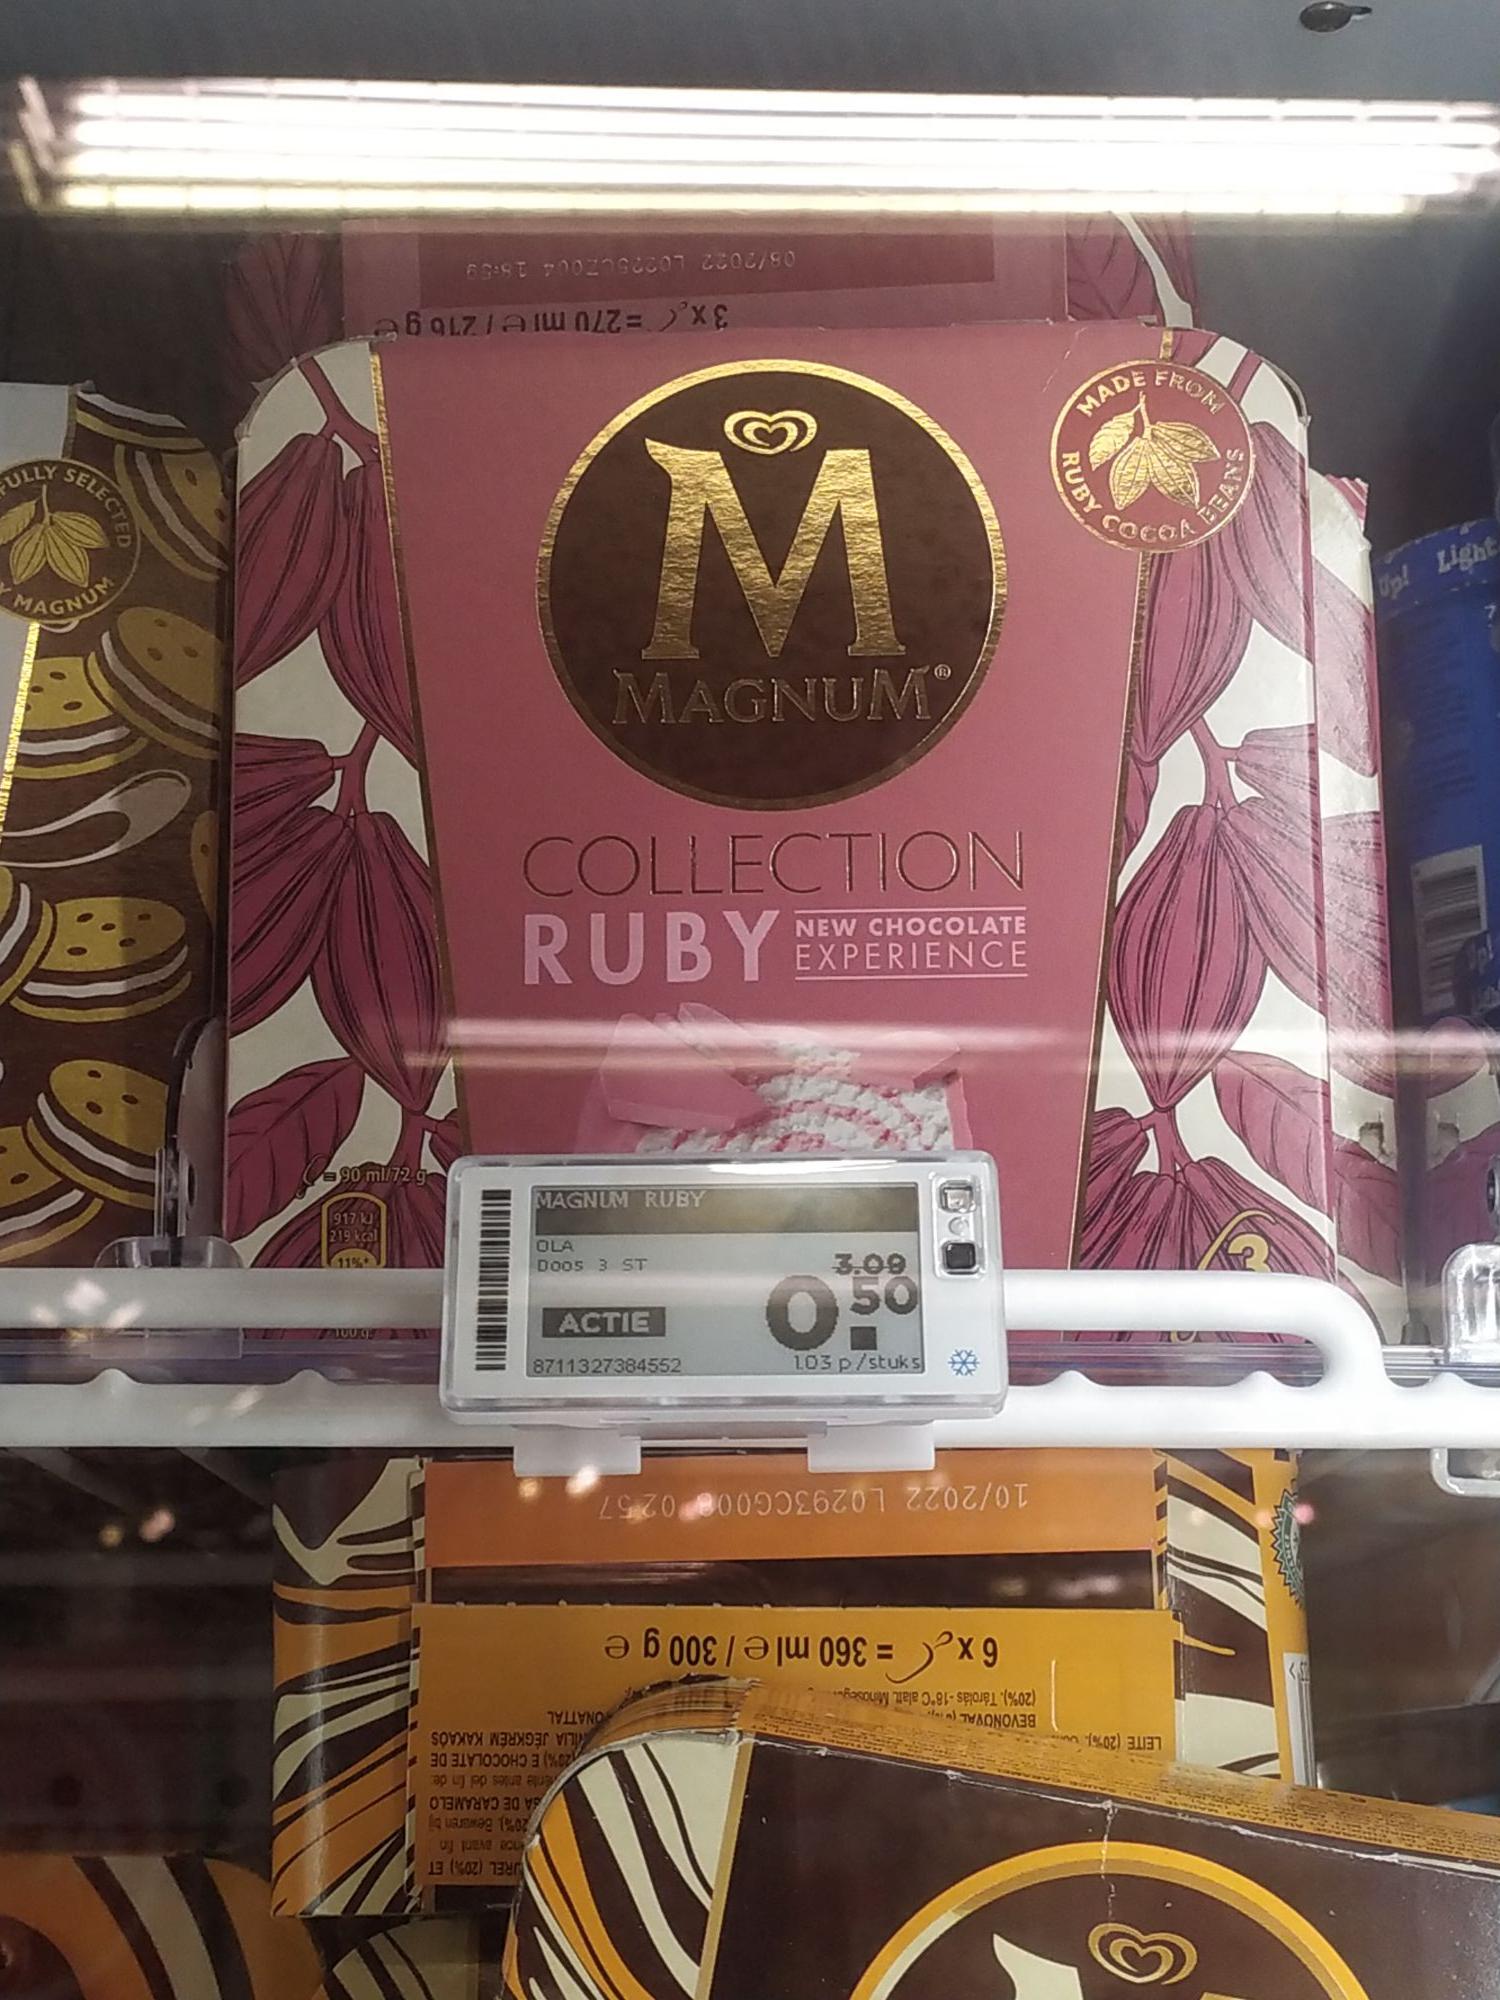 Magnum Ruby ijs bij Plus Deventer Borgele (Lokaal)